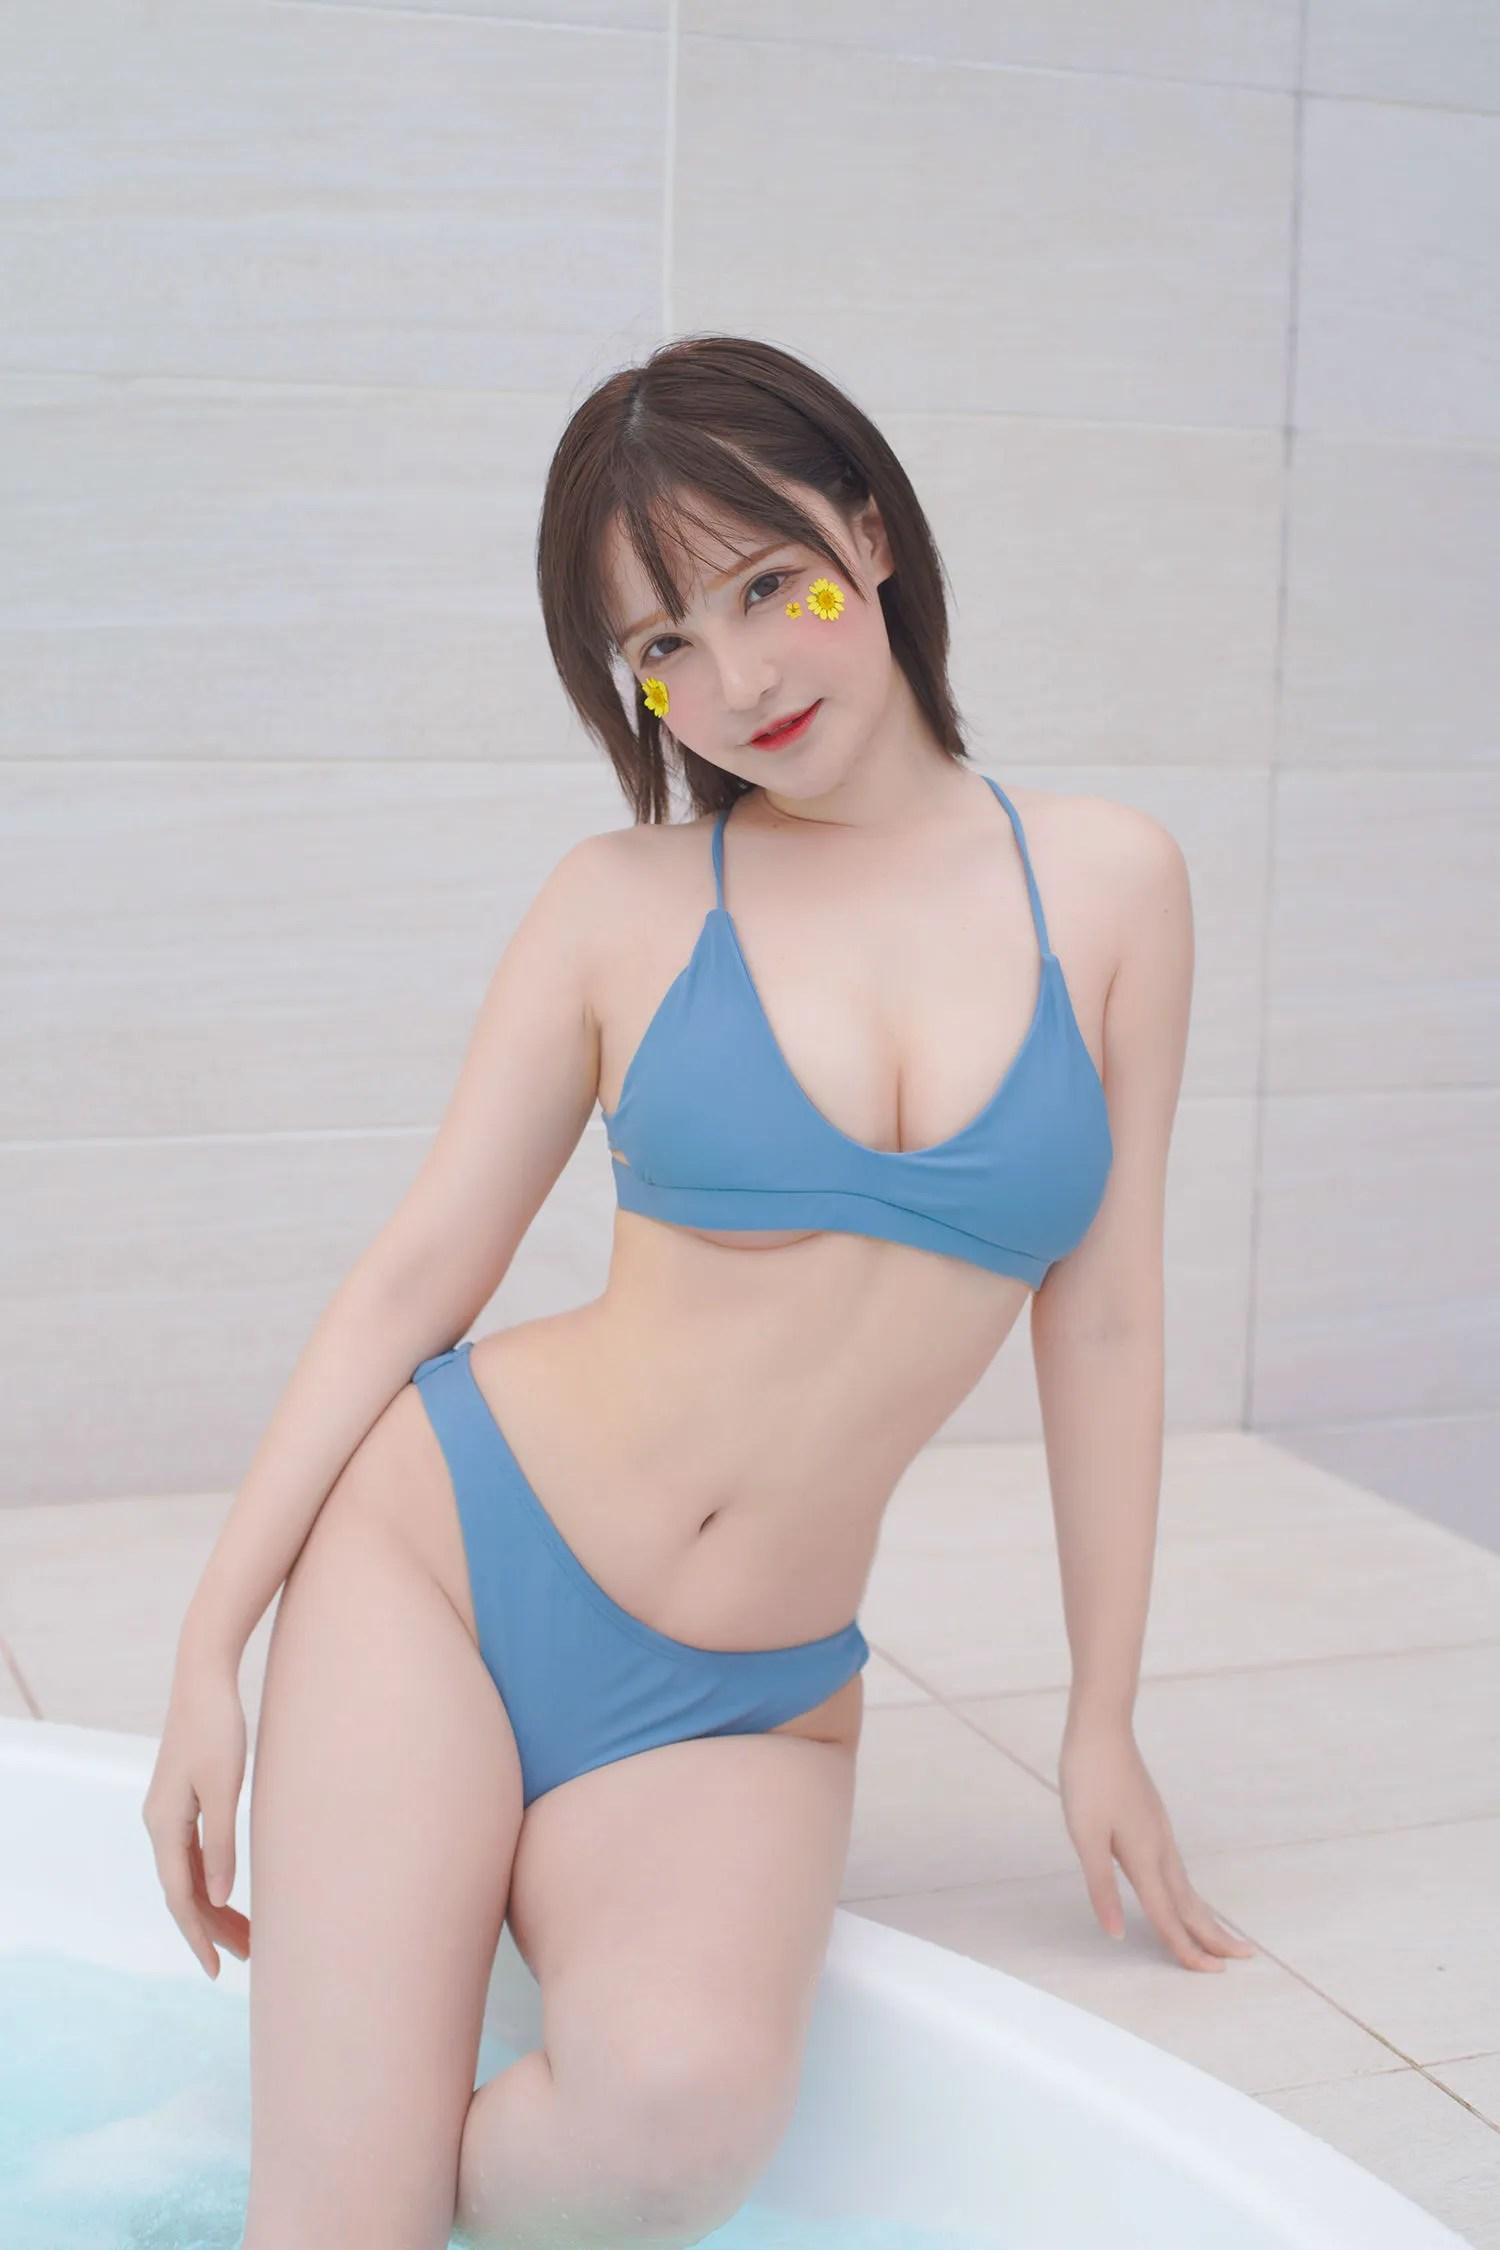 [COS福利] 千夜未来(Senya Miku)- 水着 写真套图[17P]插图(9)